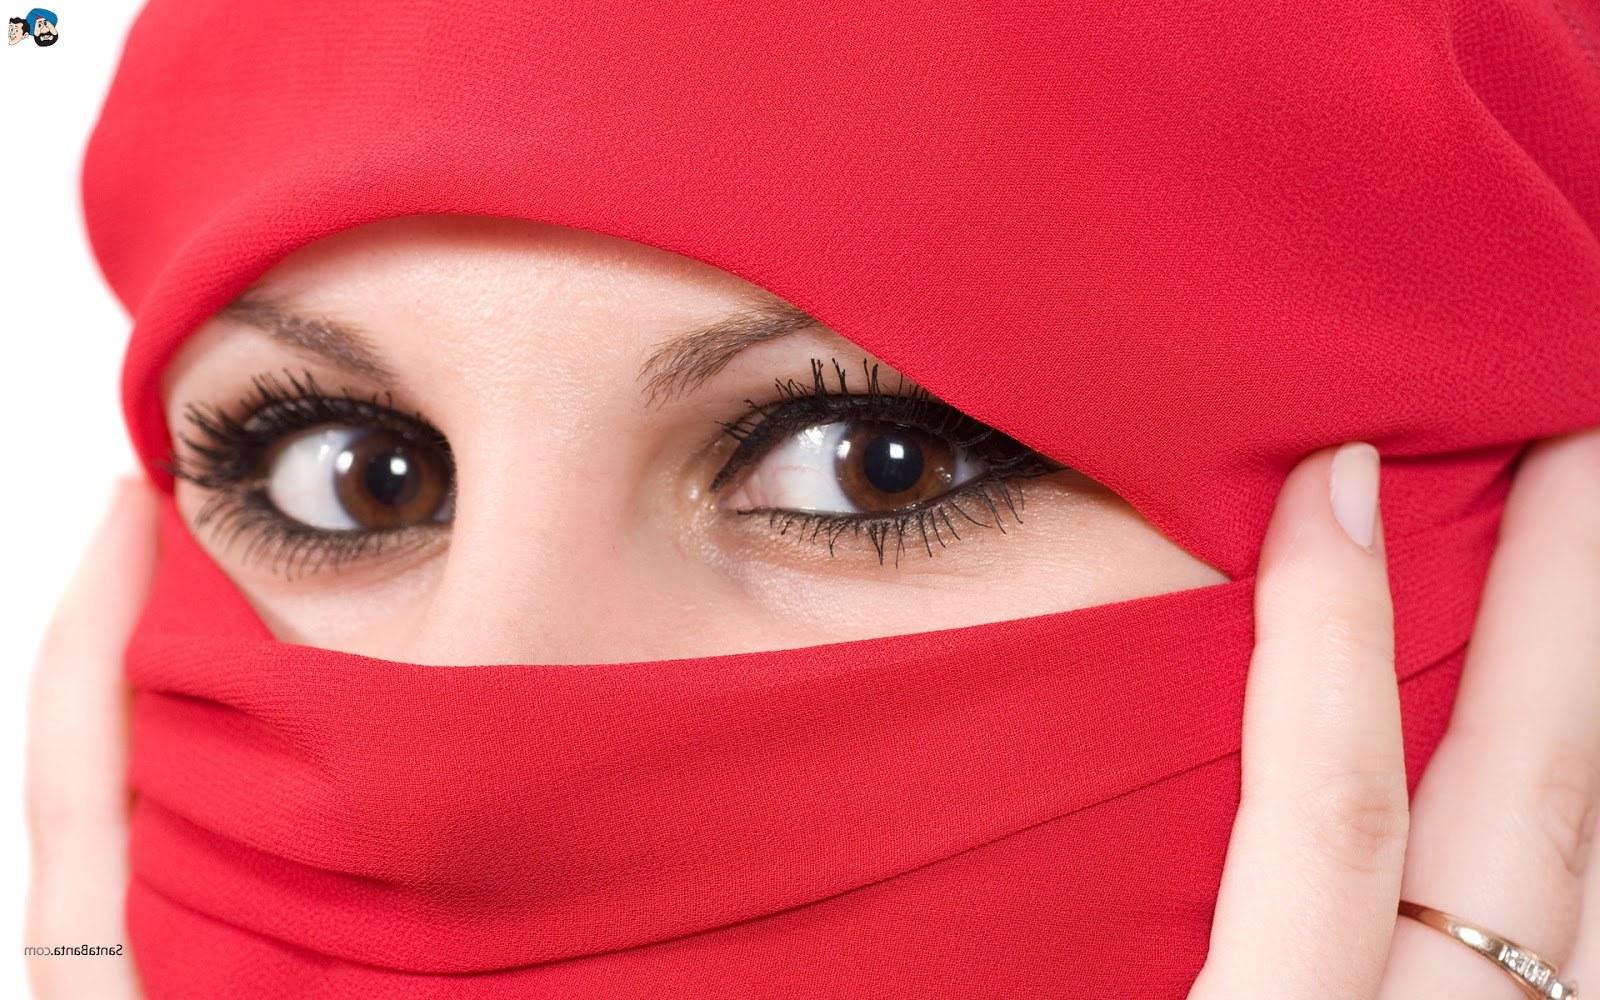 Bentuk Muslimah Bercadar Hitam S5d8 Koleksi Wallpaper Wanita Muslimah Bercadar